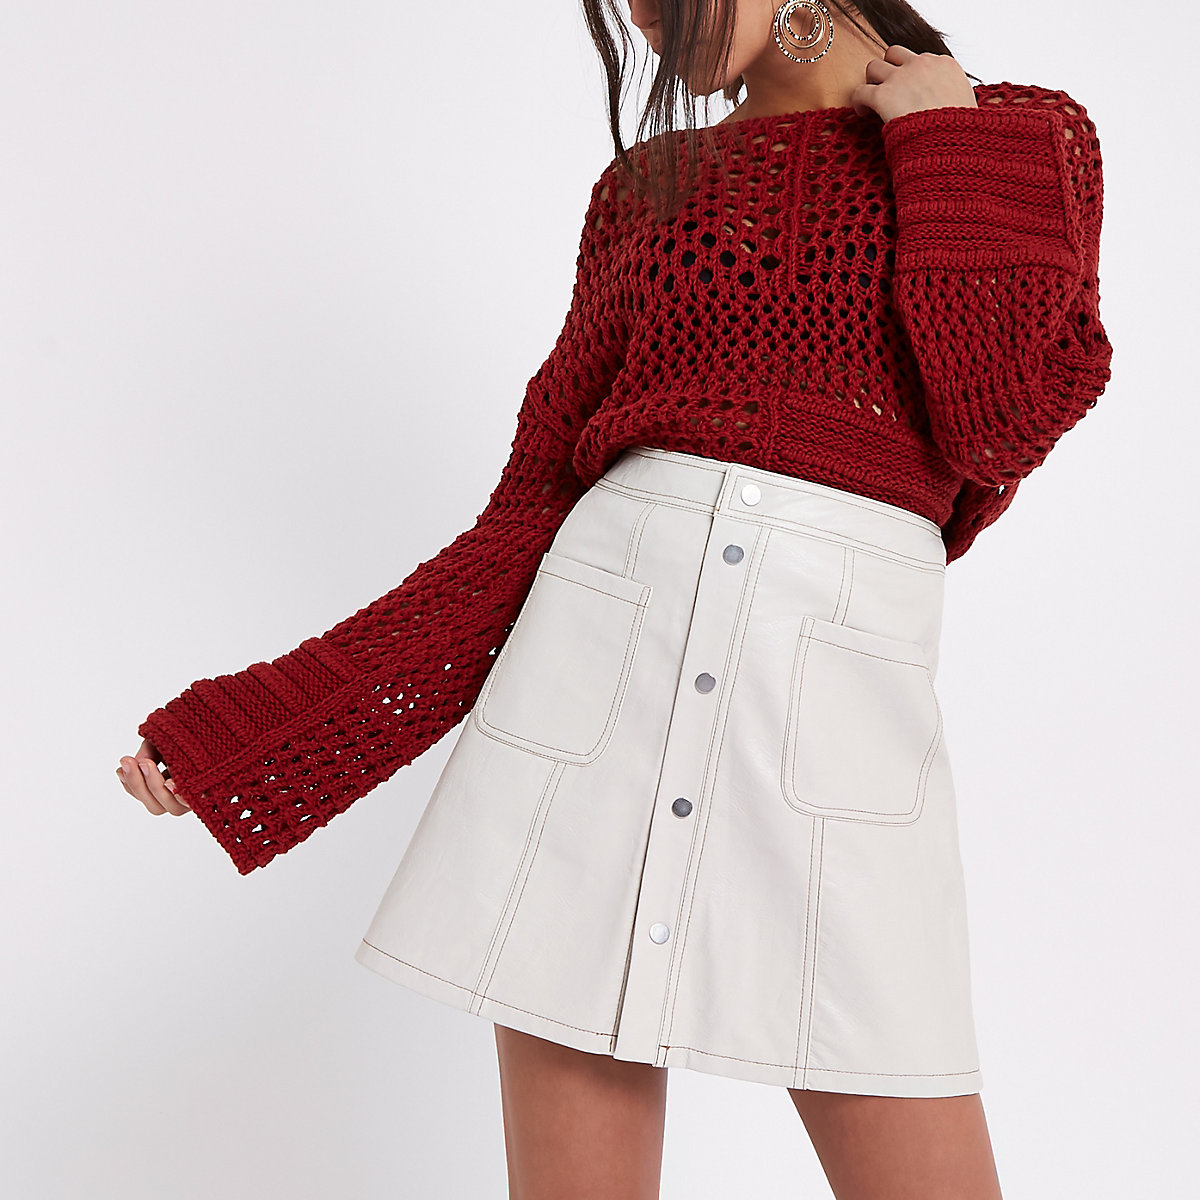 Cream faux leather A line mini skirt